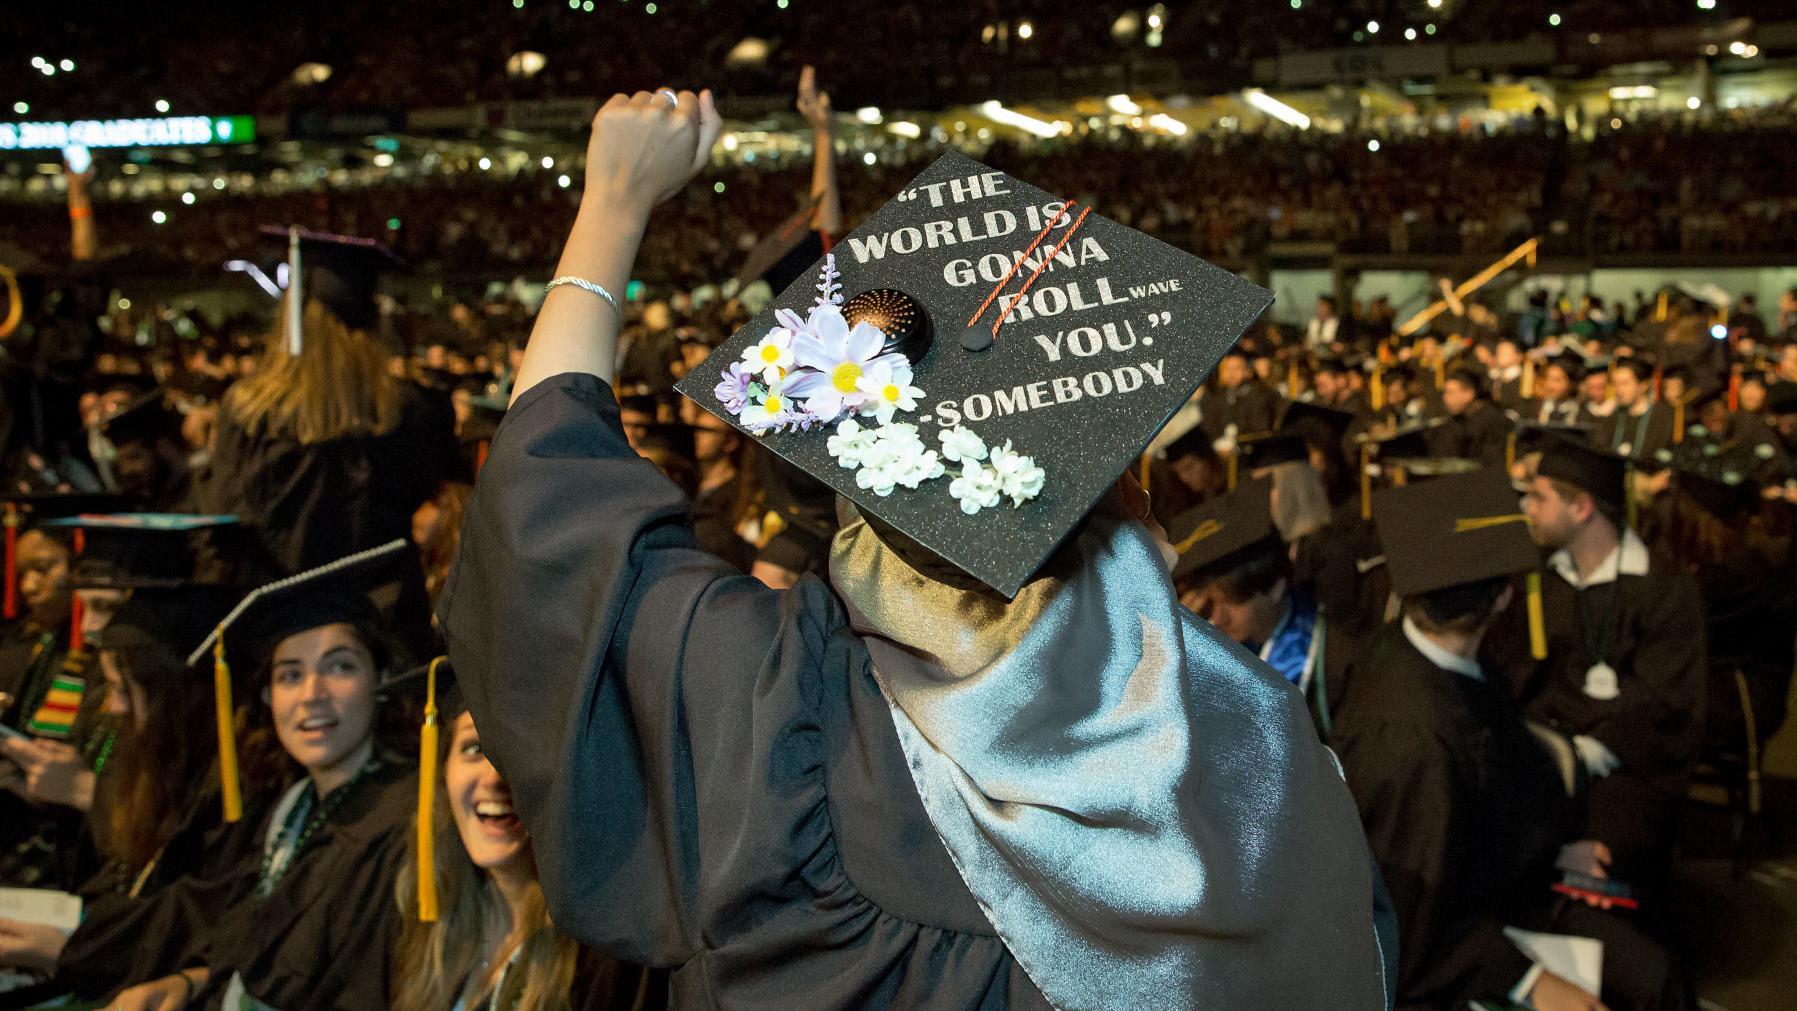 Tulane University Announces Graduates Receiving Degrees Saturday Entertainment Life Nola Com Marcus parks is an actor and writer, known for last podcast on the left: tulane university announces graduates